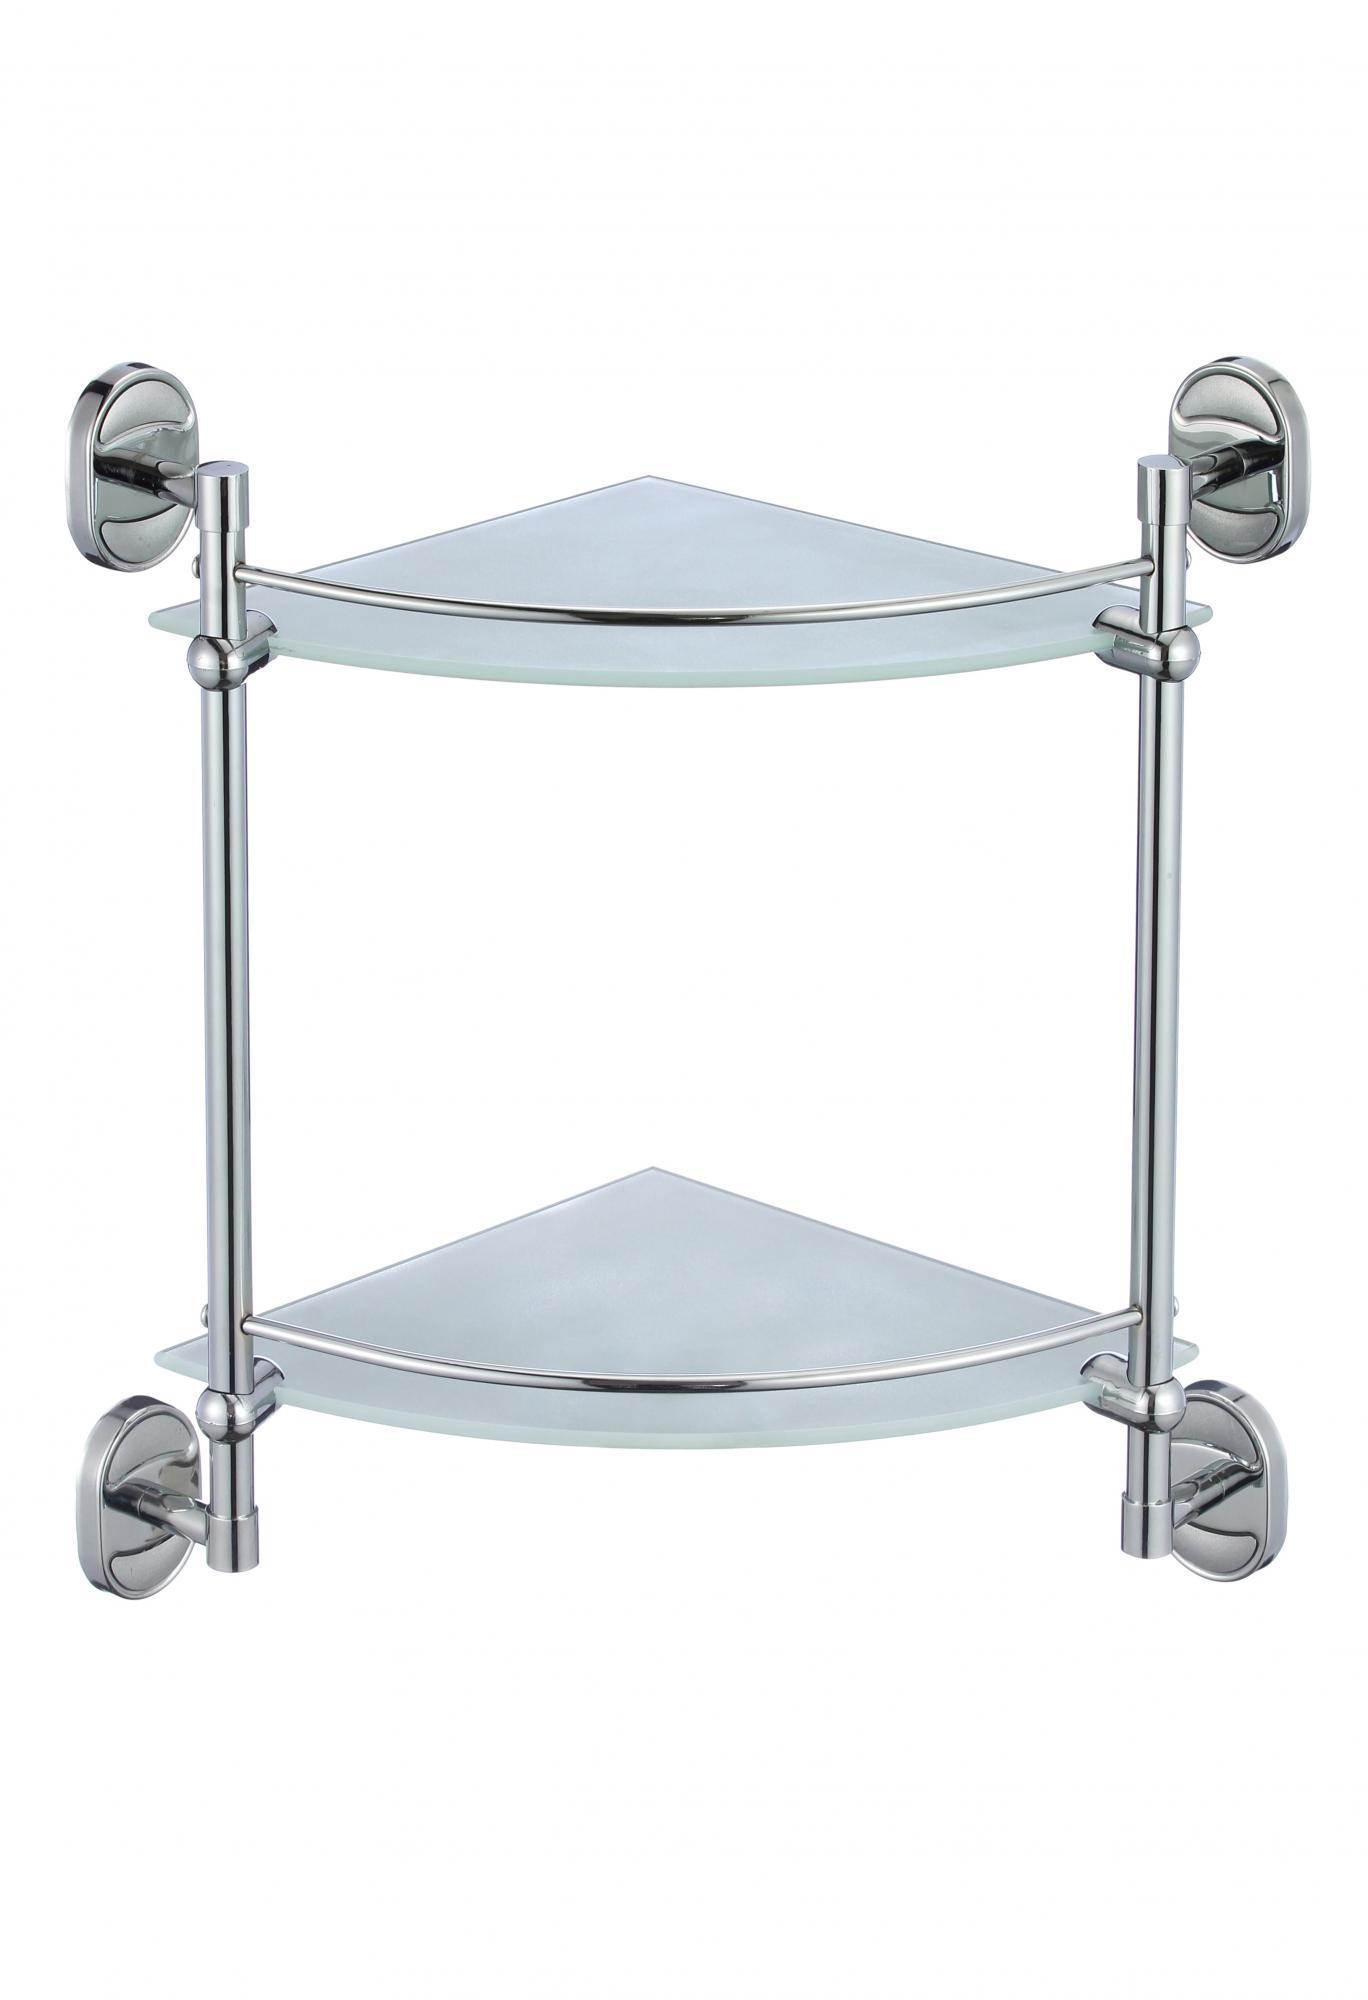 Полка угловая двойная стеклянная Savol S 007073